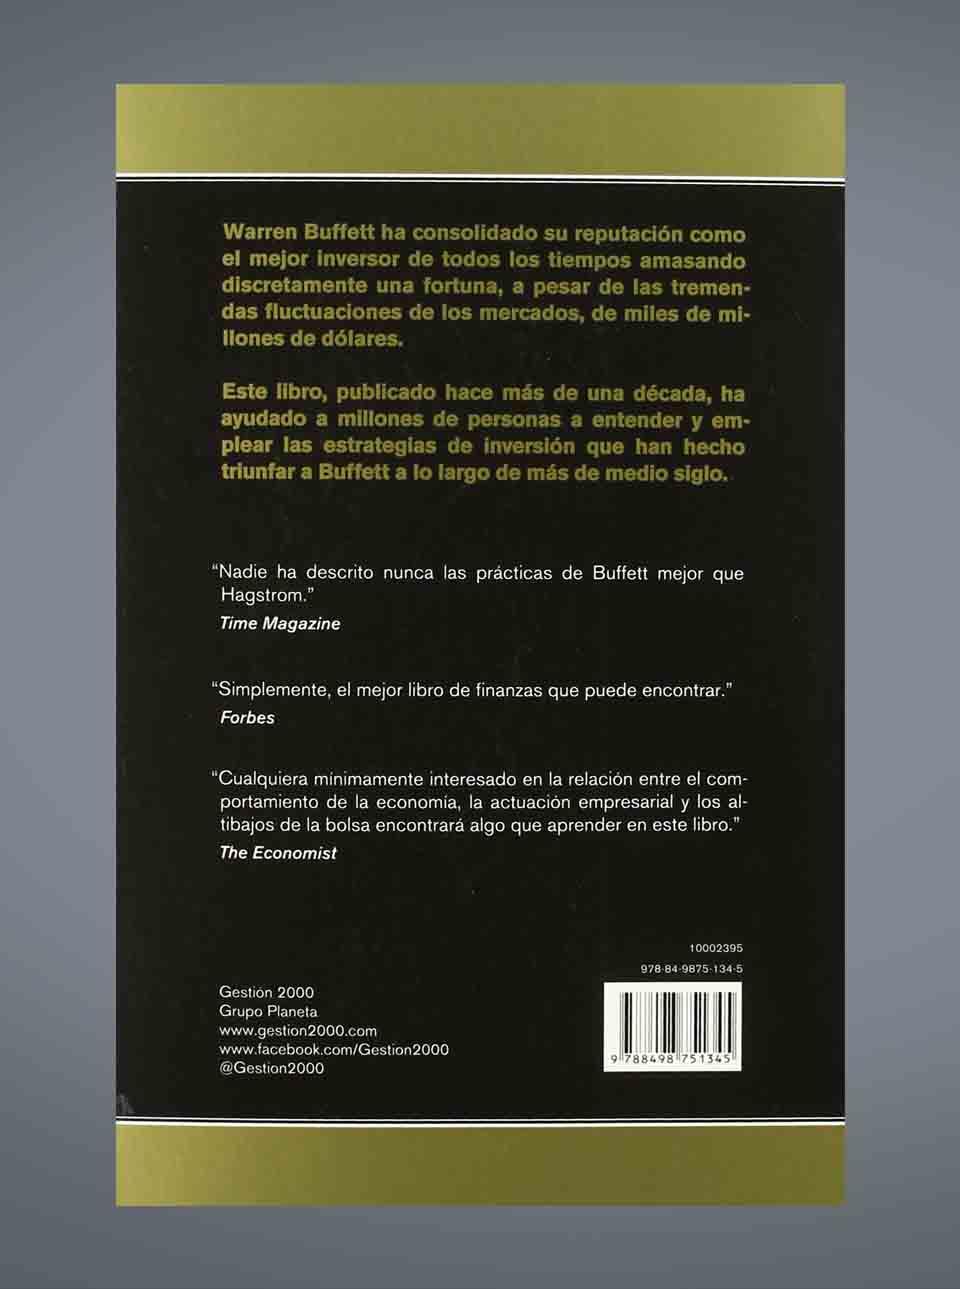 libro Warren Buffett Robert G. Hagstrom